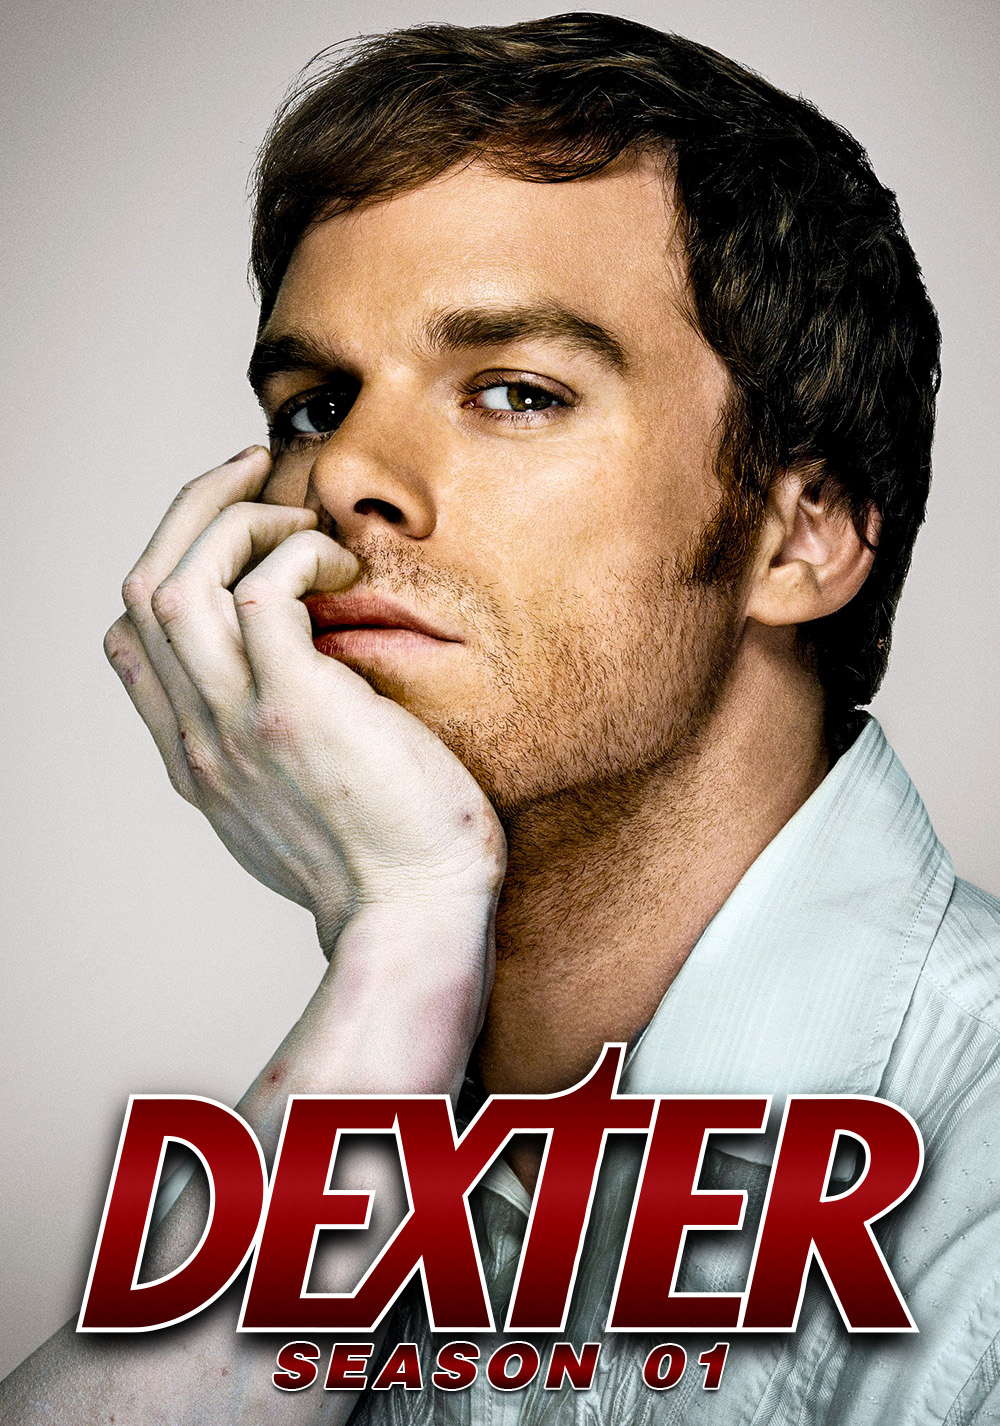 Dexter|Colección 1-8|Latino-Ingles|1080p|96/96|x265 10bit|+ Soundtracks  Season01-poster